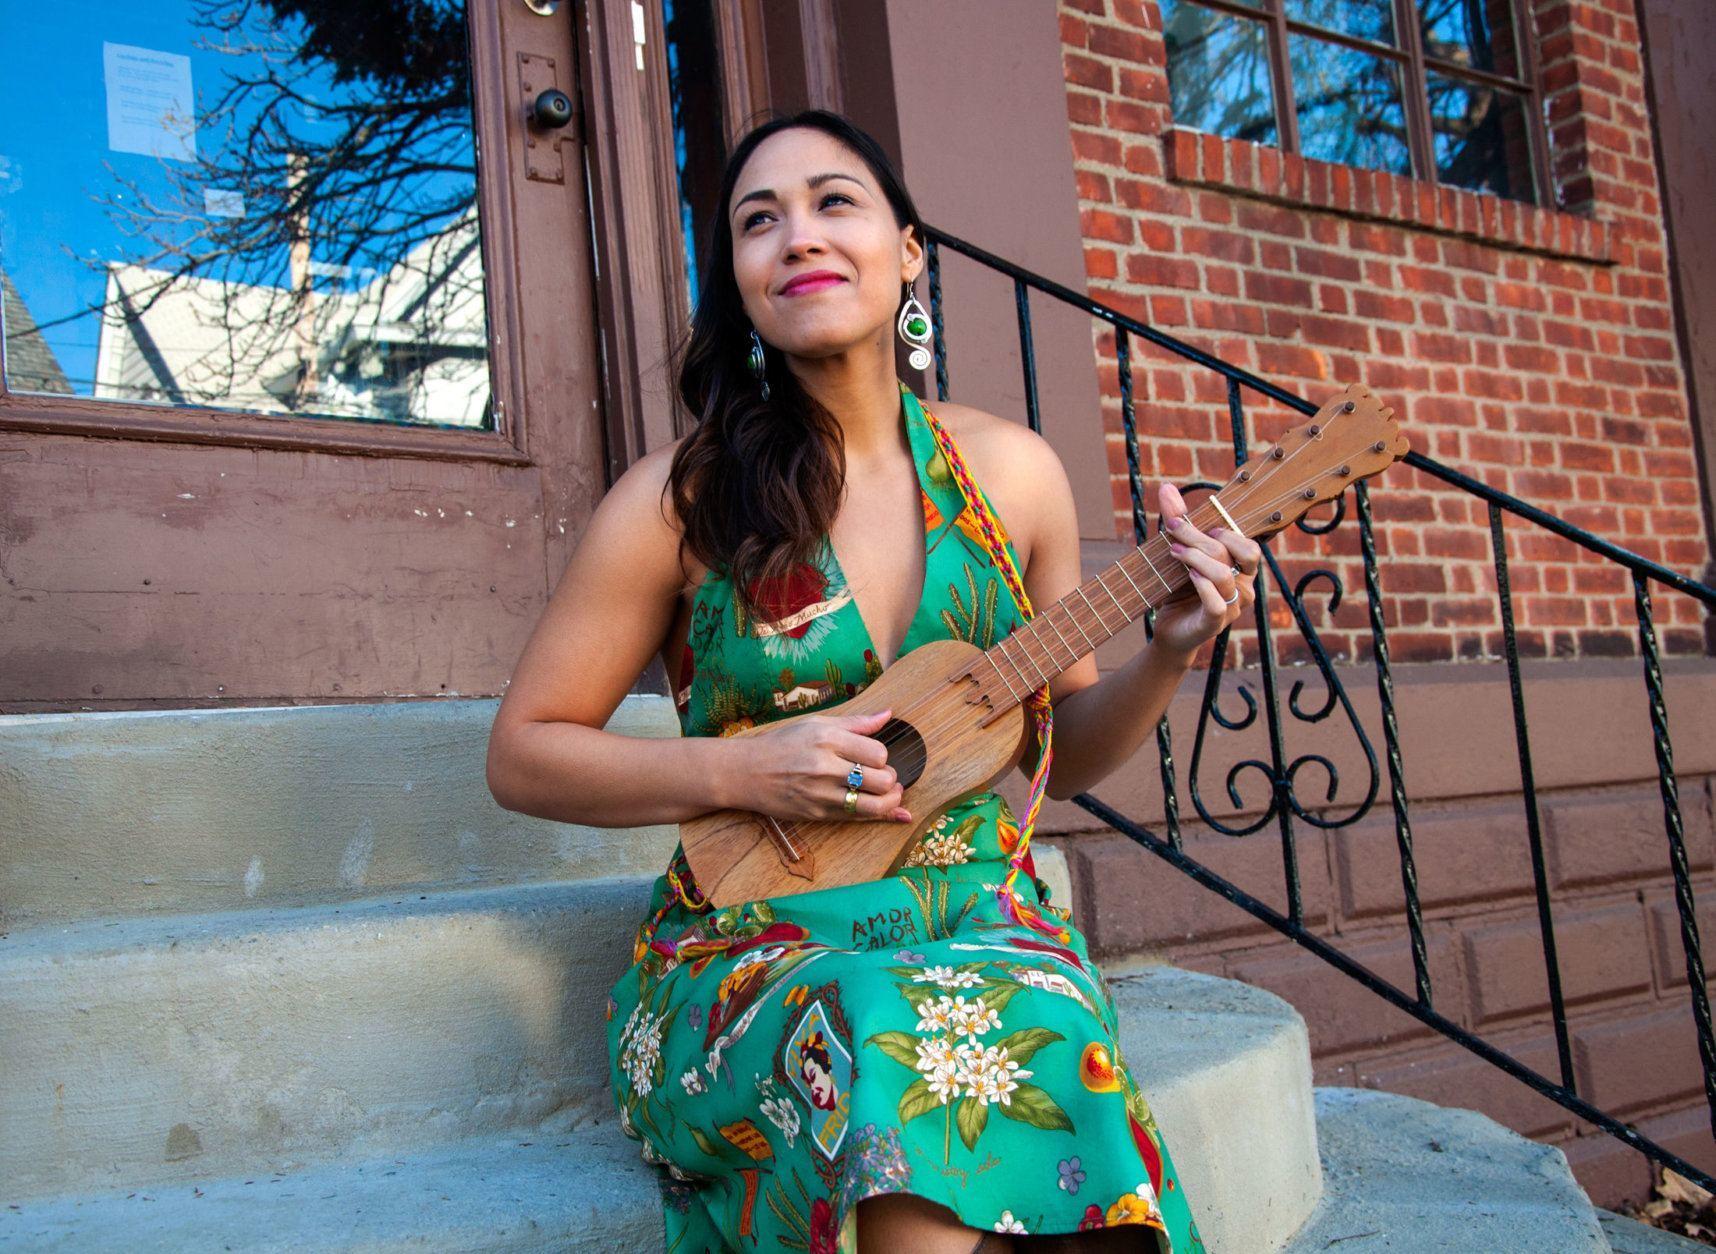 Sonia De Los Santos will perform Sunday at the Smithsonian Folklife Festival. (Courtesy Mikel Melcon)